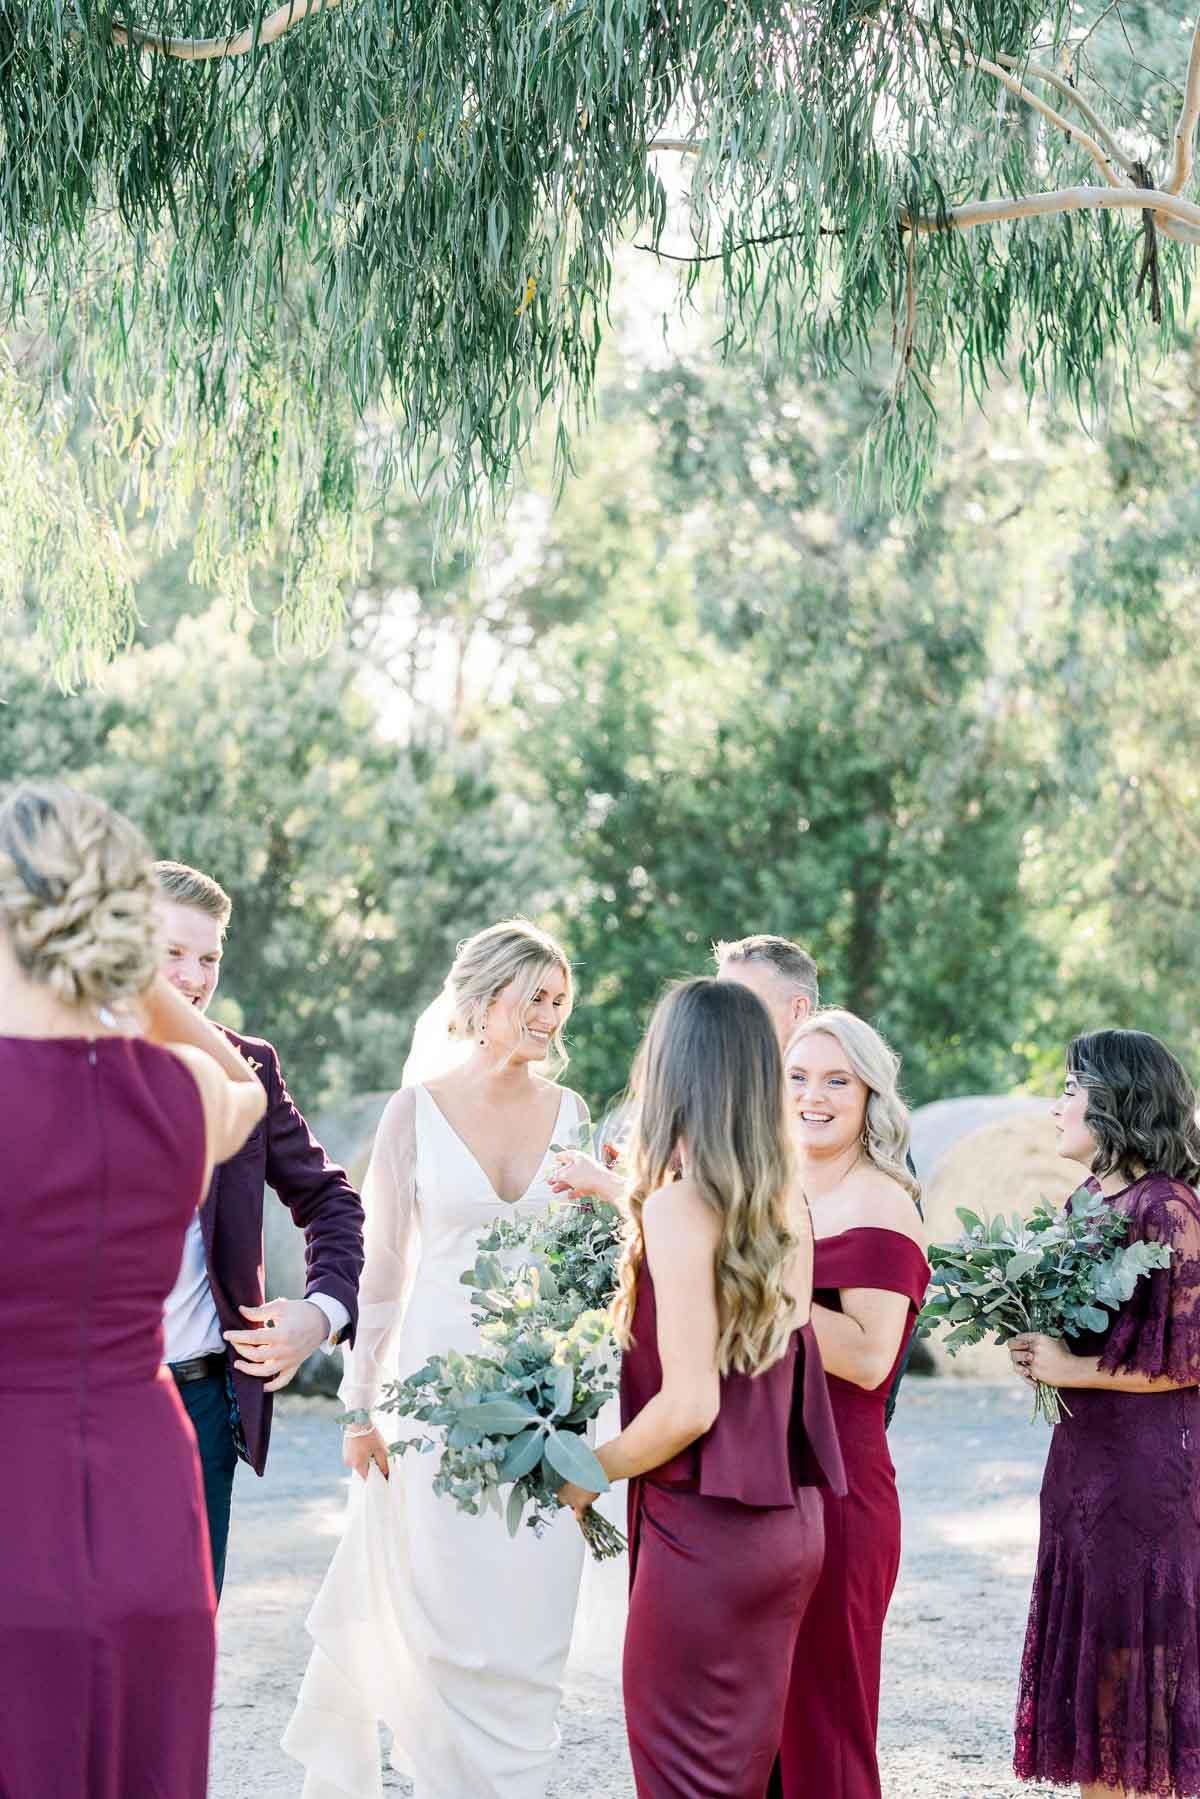 rustic-yarra-valley-wedding-venue-acacia-ridge-georgia-james-07991.jpg